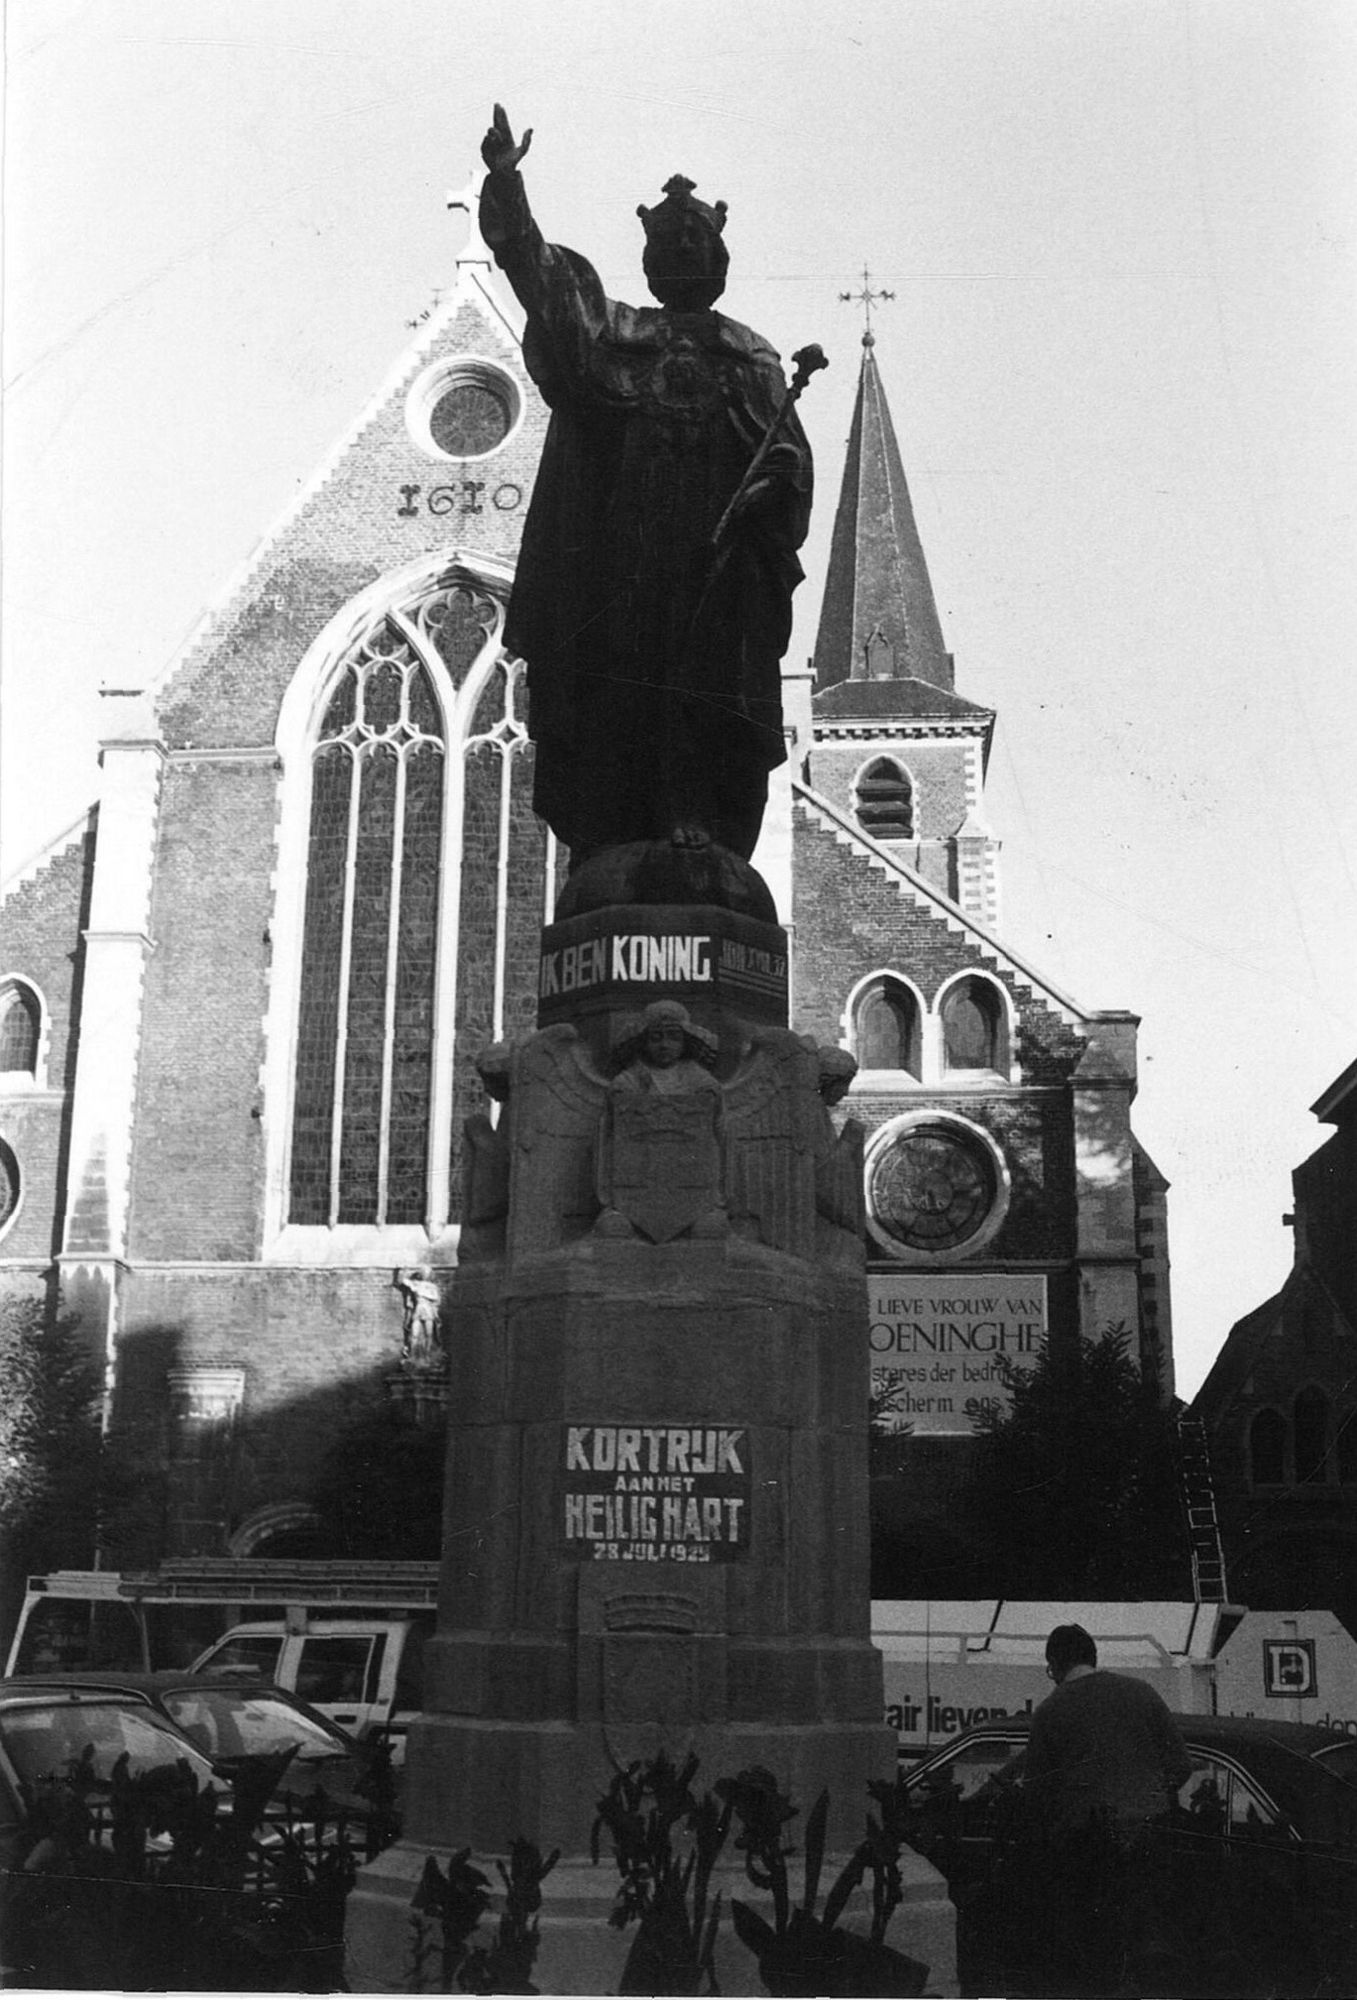 Christus Koning op het Sint-Michielsplein